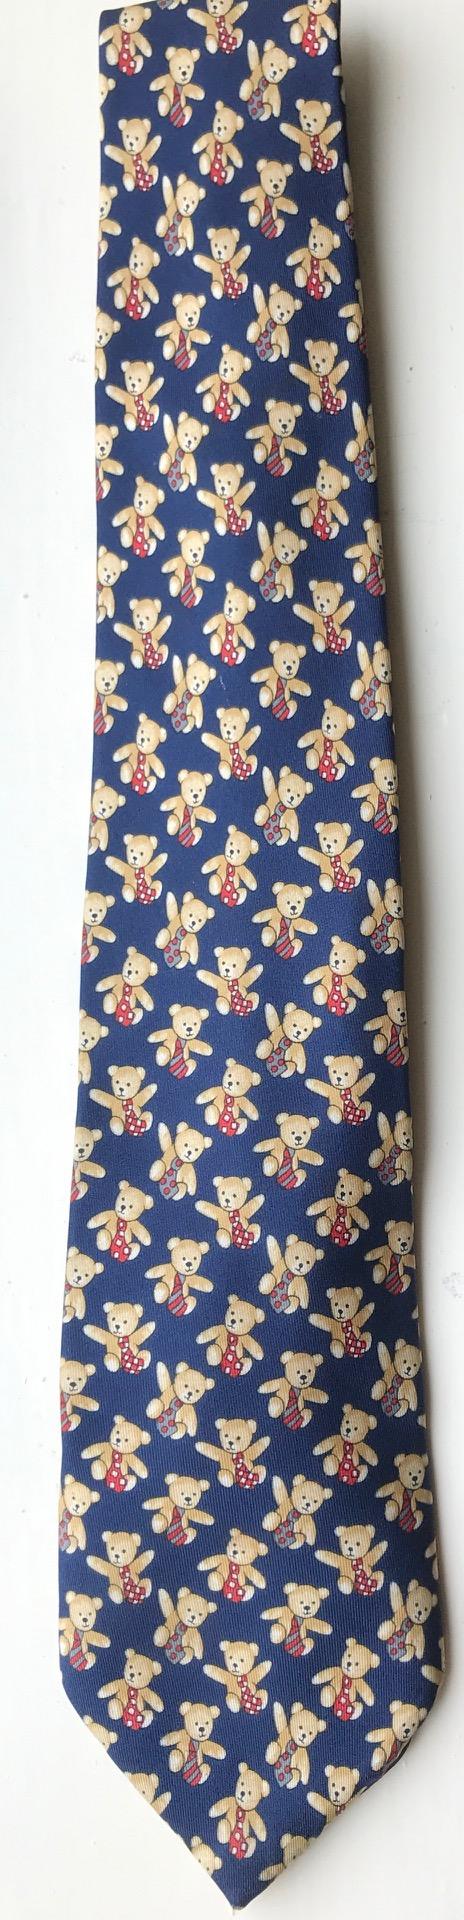 "Ties: The now Official ""Mindfully Bertie"" tie."